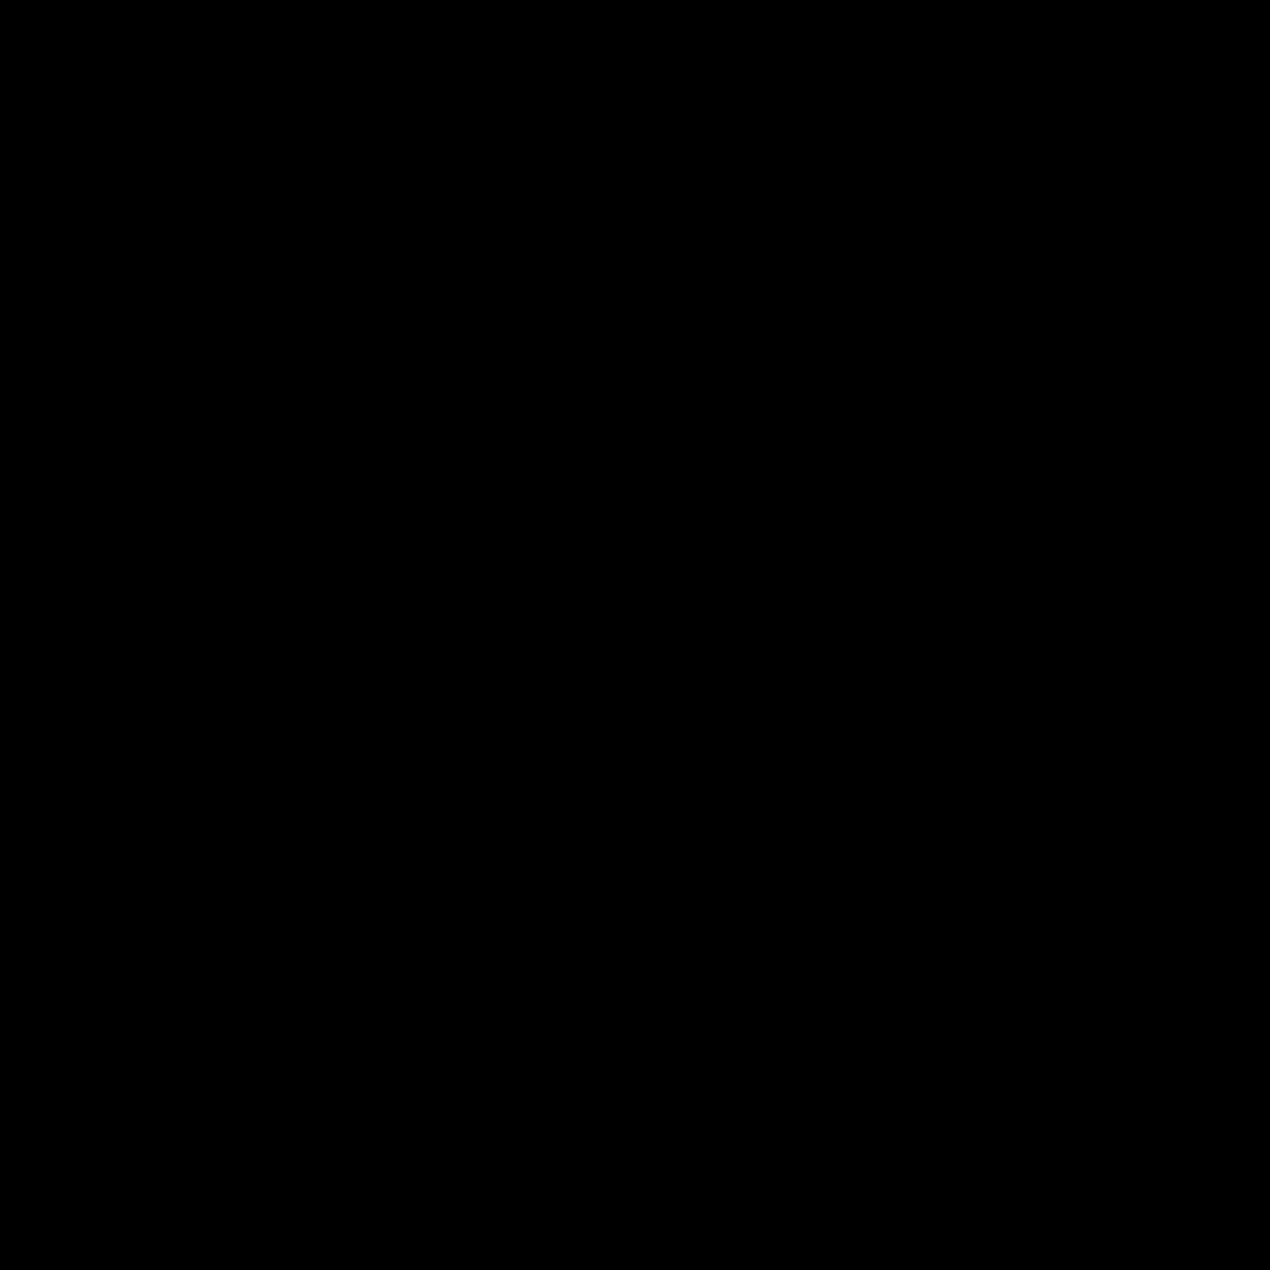 file5-3